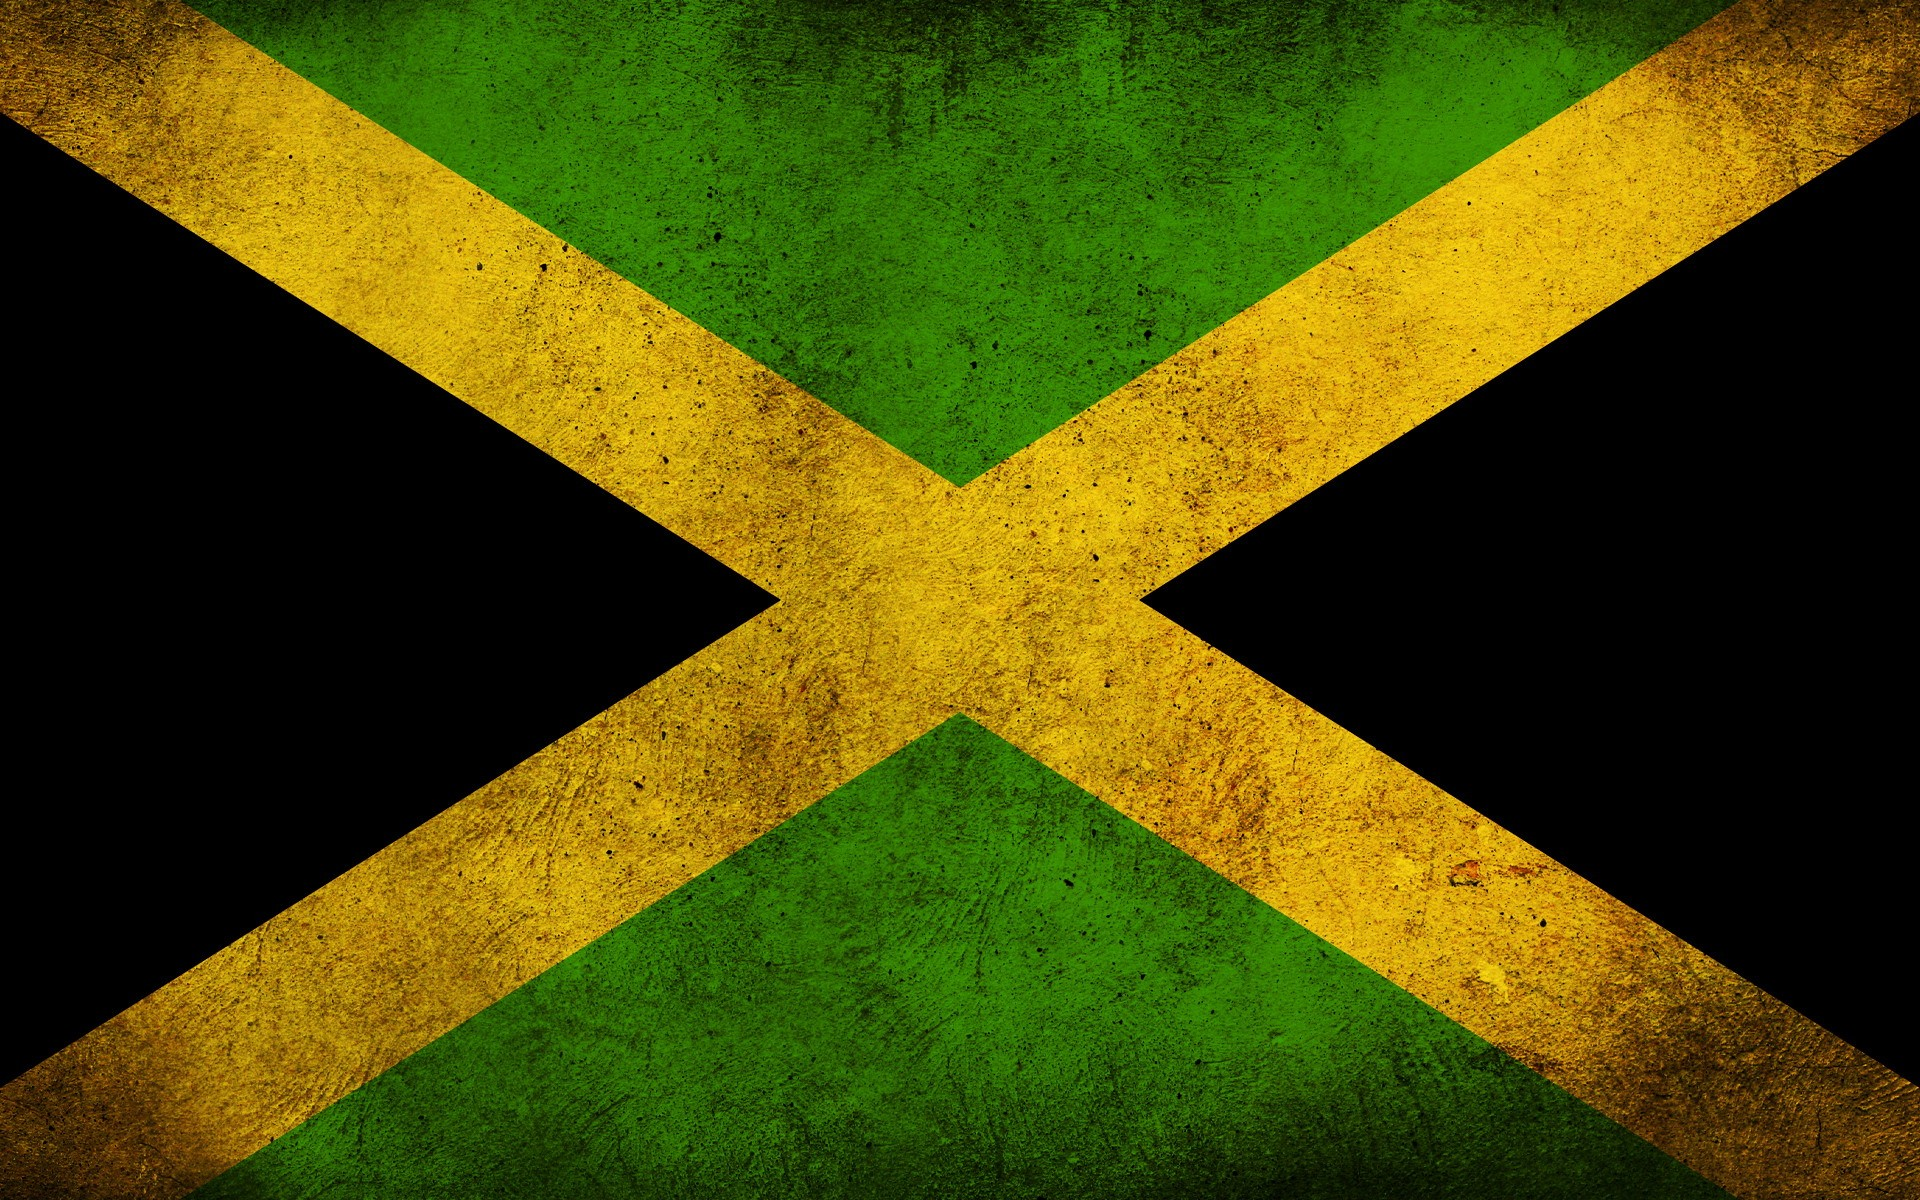 jamaican flag wallpaper - photo #20